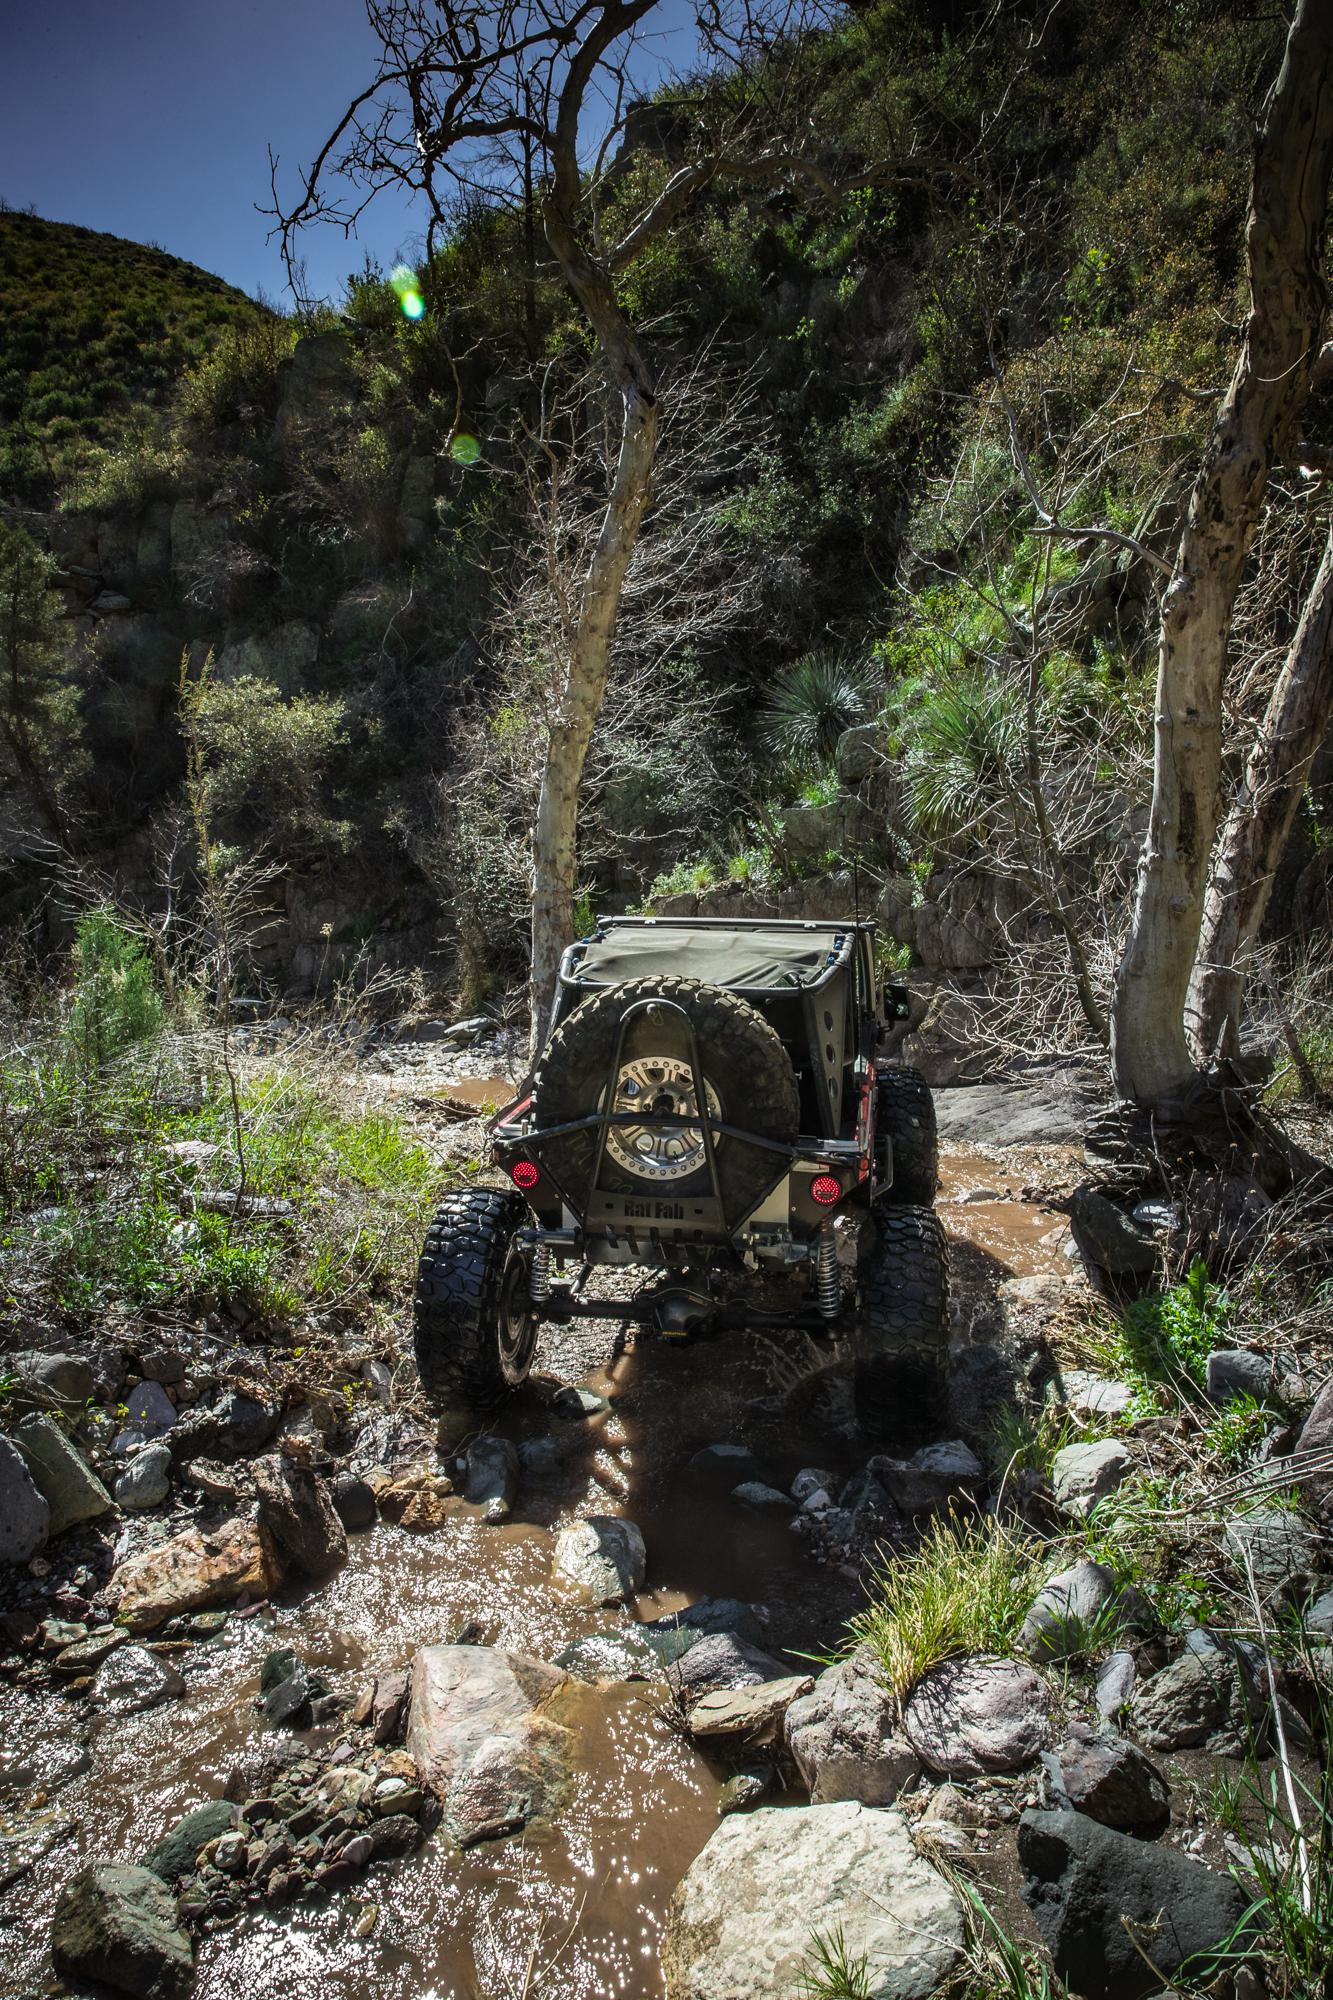 Jeeps Sycamore Creek 3_25_17 WEB-2.jpg